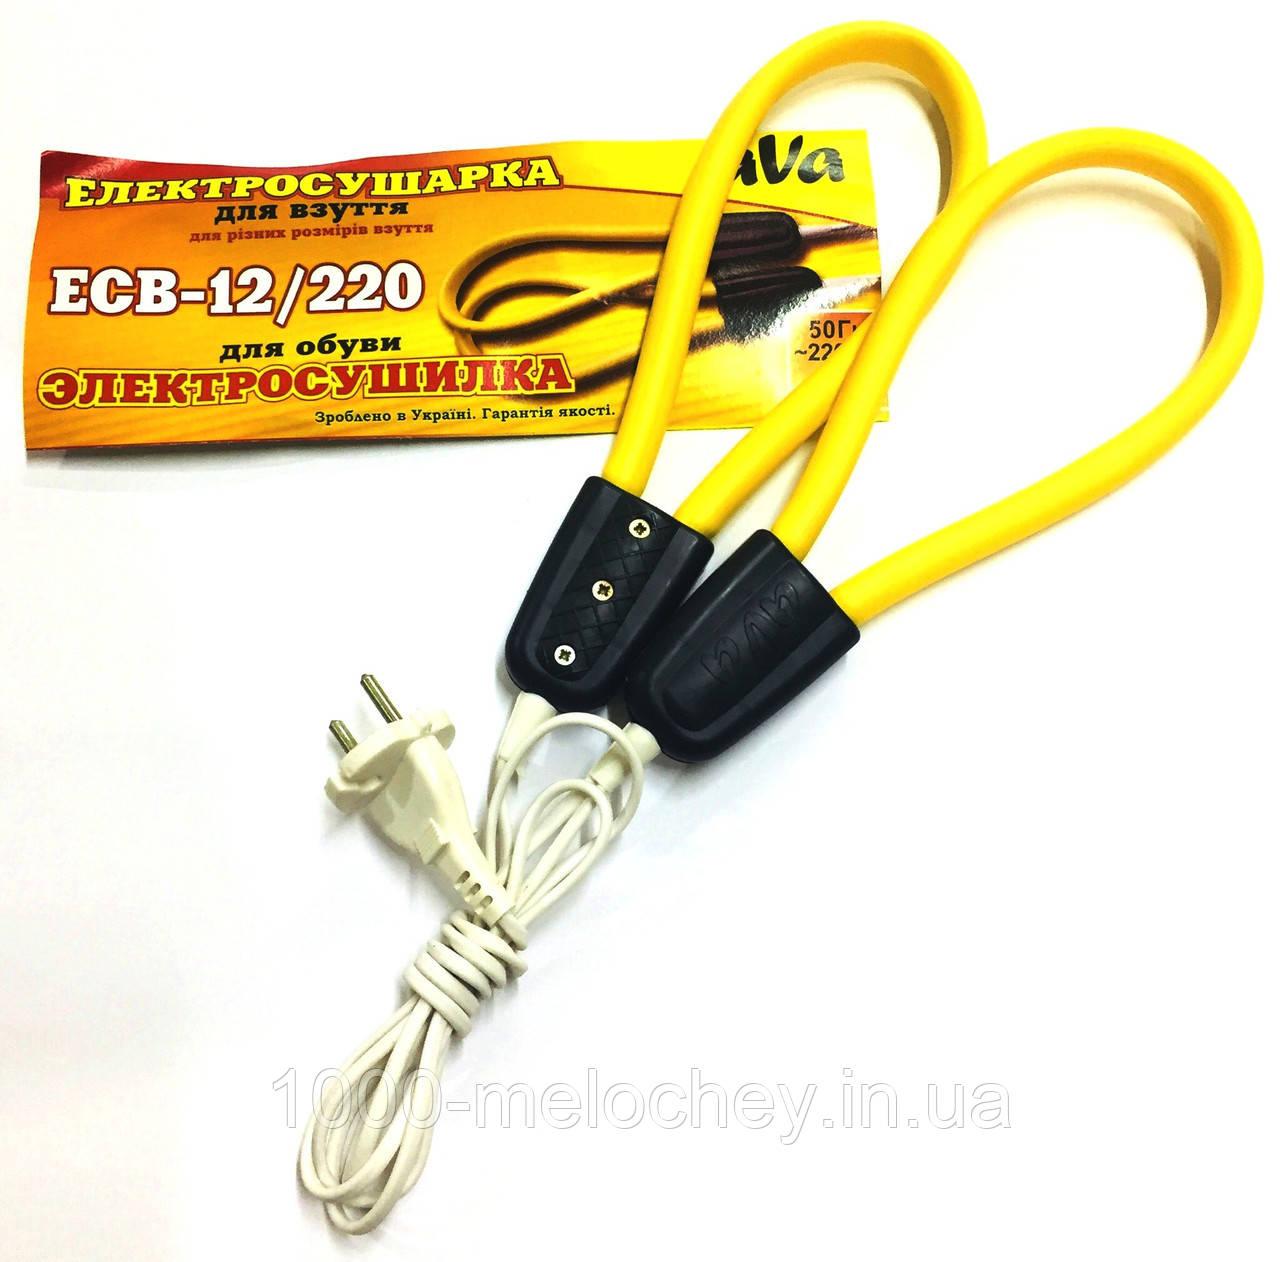 Сушилка для обуви AVA, электросушилка для обуви, Украина